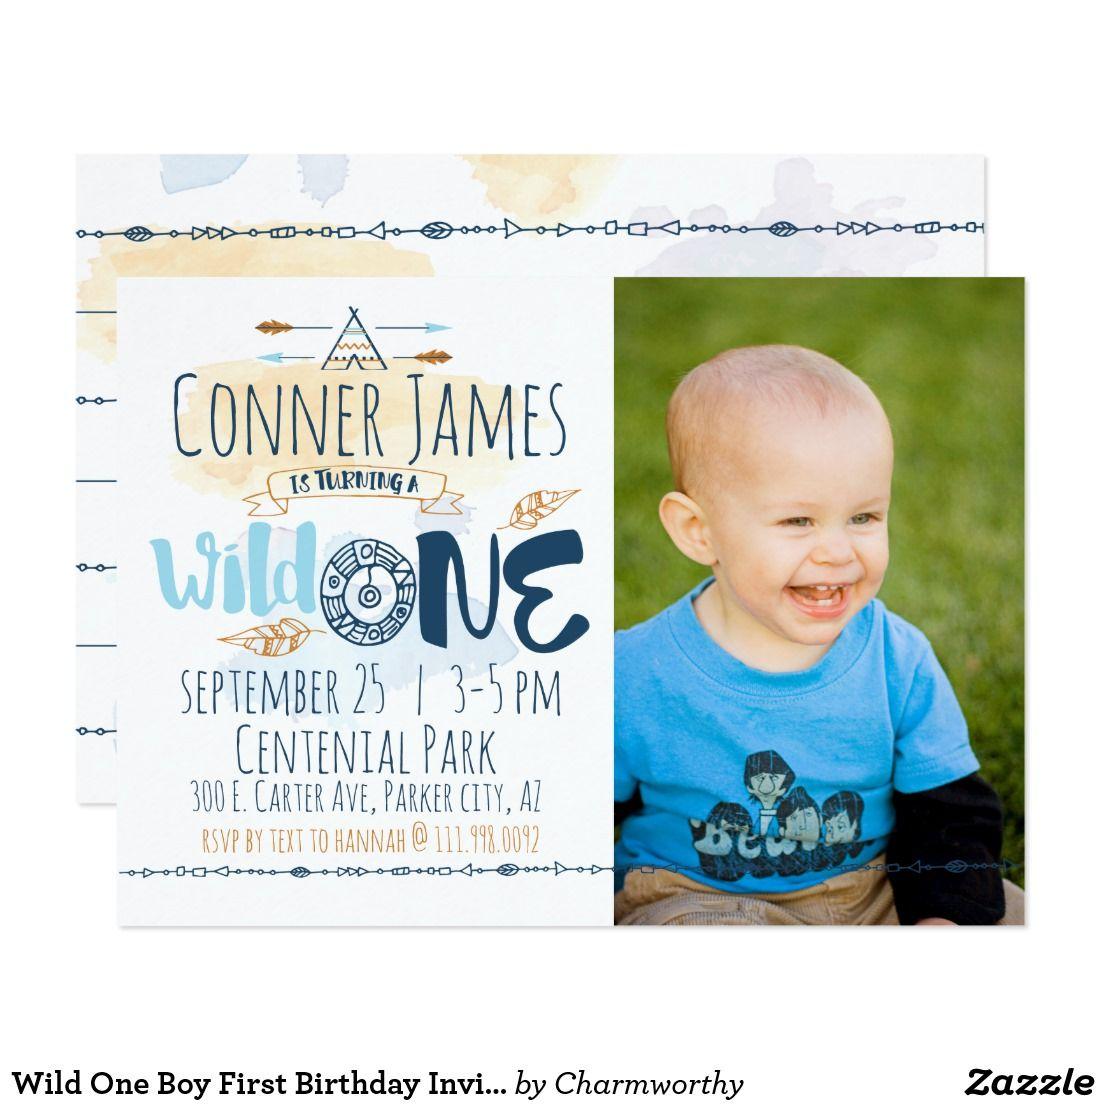 Wild One Boy First Birthday Invitation   Invitation cards ...